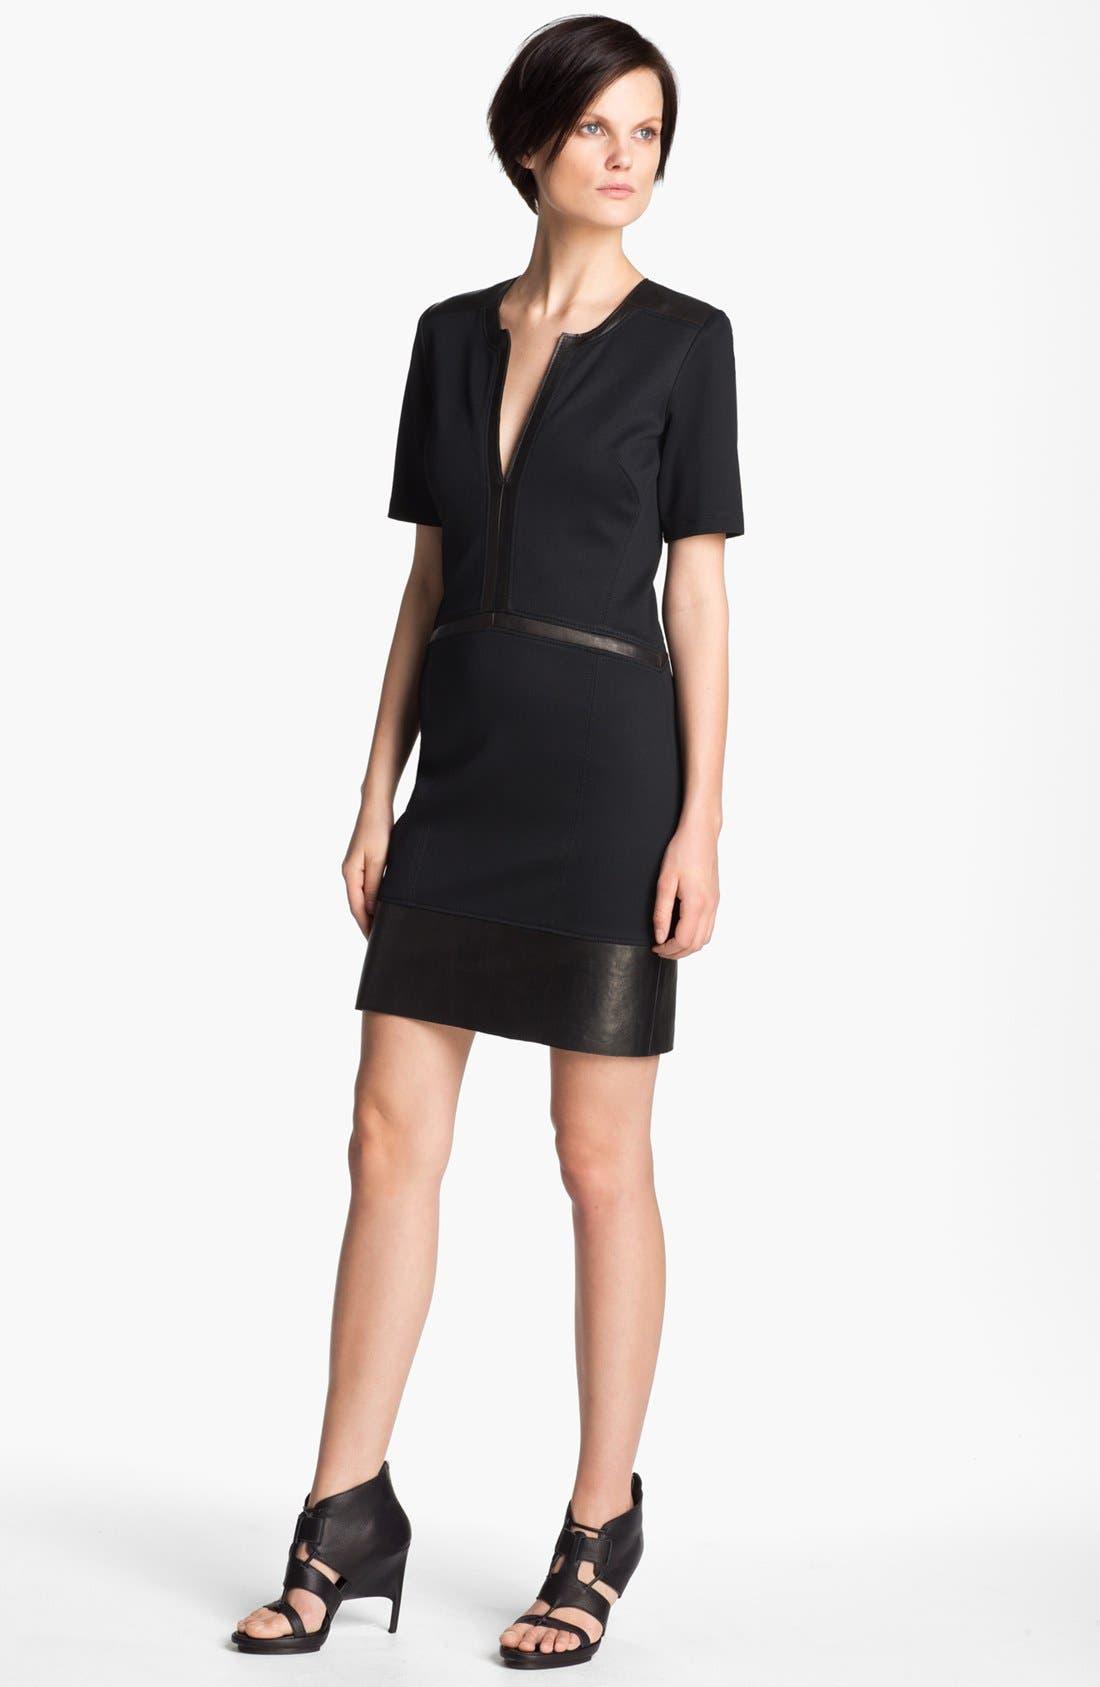 Main Image - Helmut Lang 'Motion' Leather Trim Dress